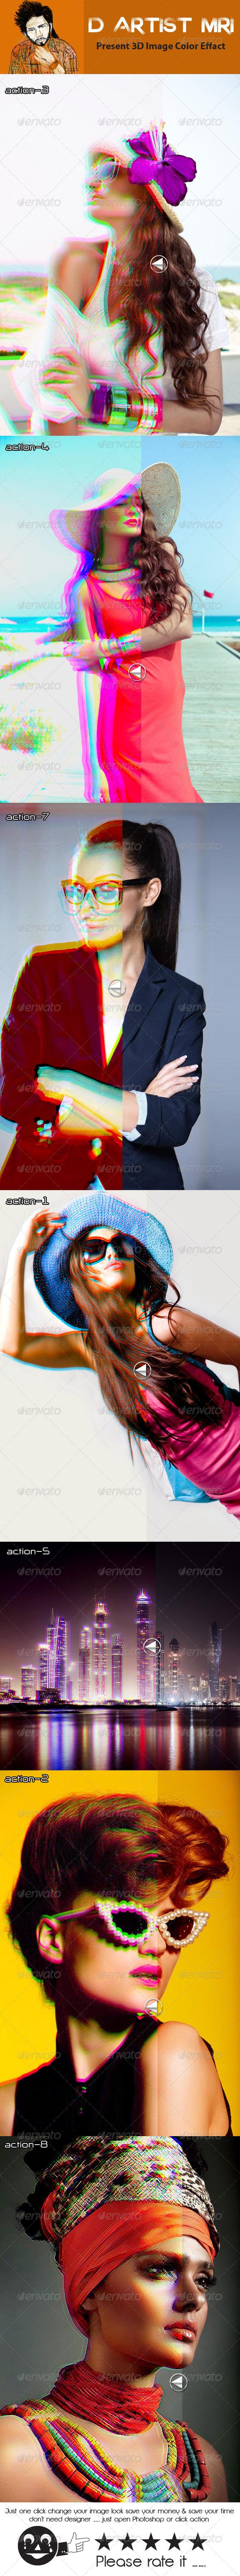 GraphicRiver 3D Image Color Effact 8189392